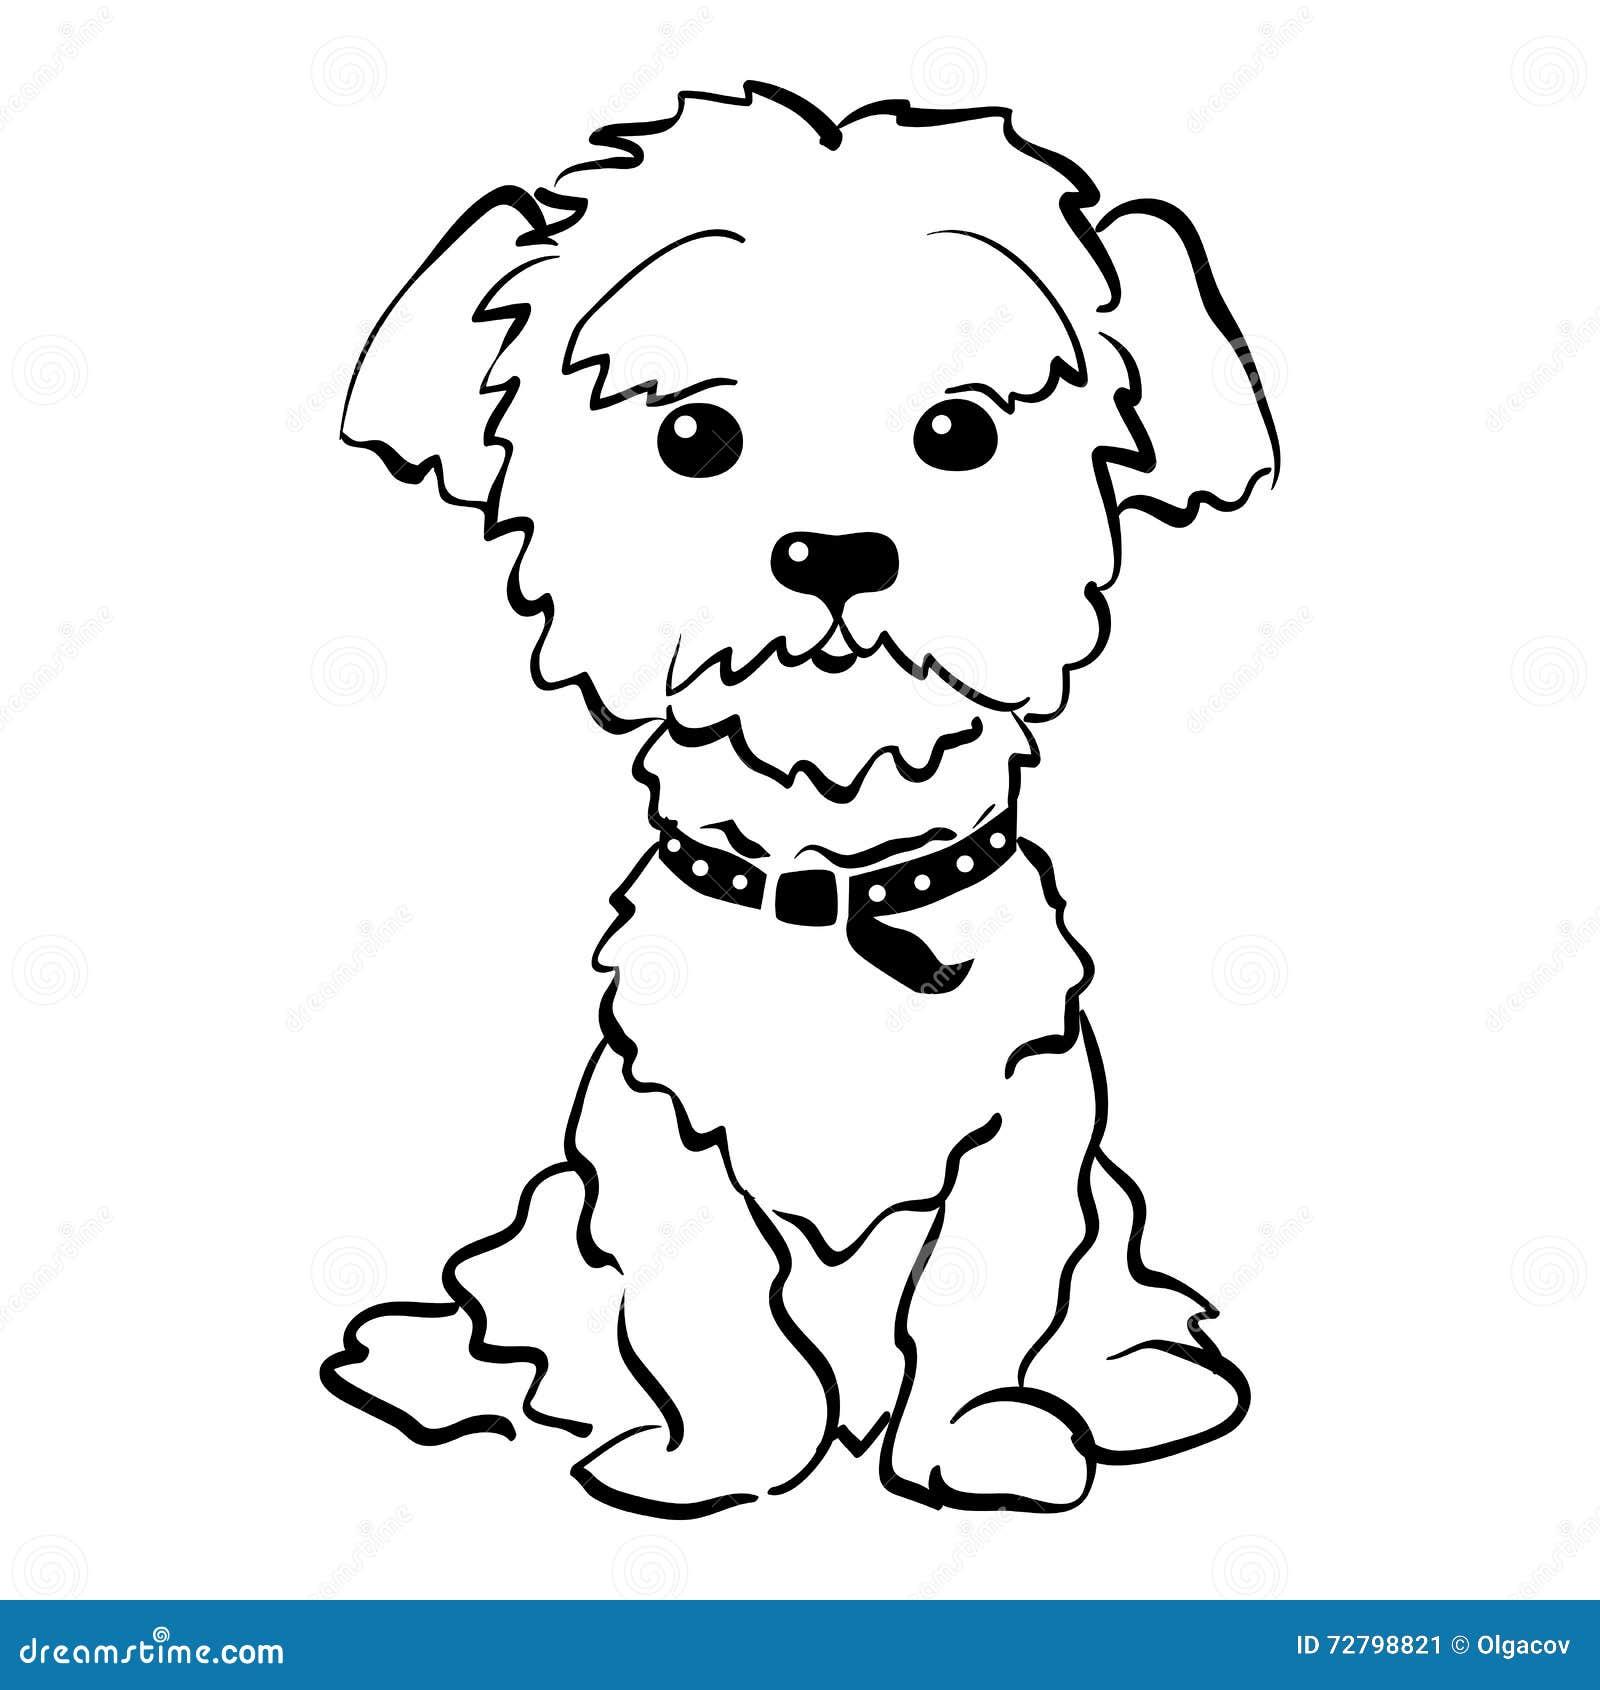 free clipart maltese dog - photo #45